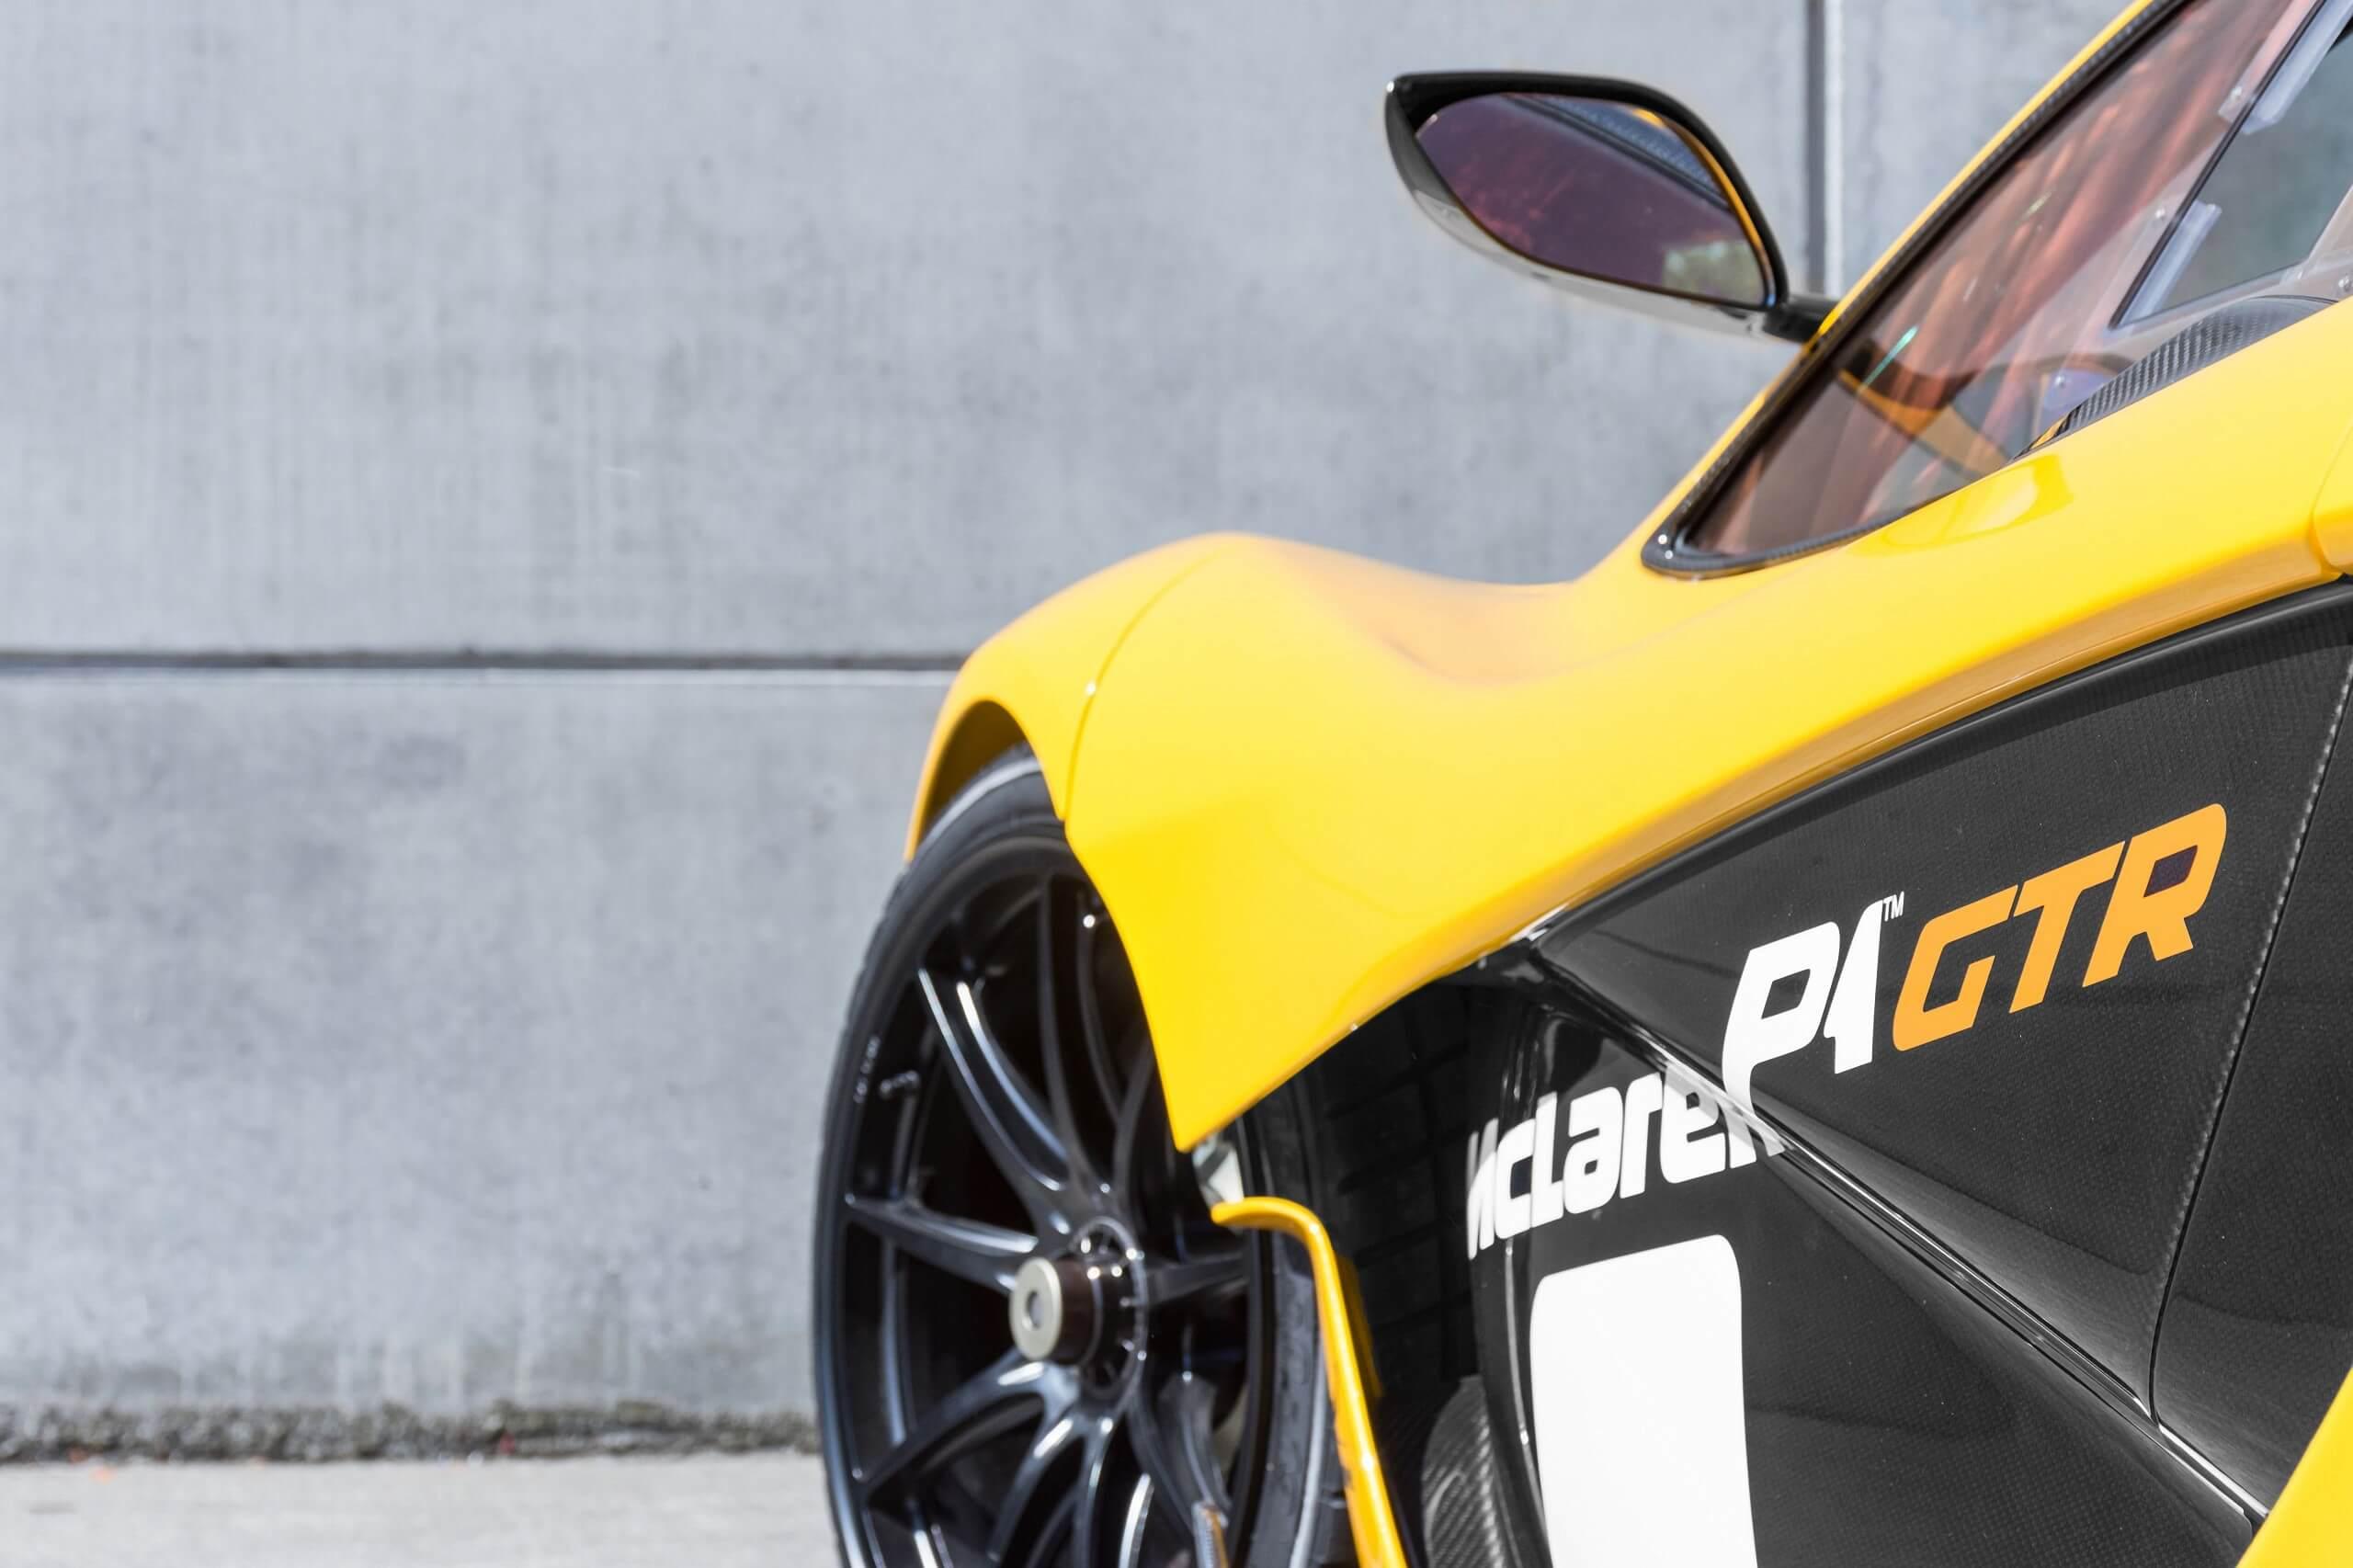 Street-legal-McLaren-P1-GTR-for-sale-31